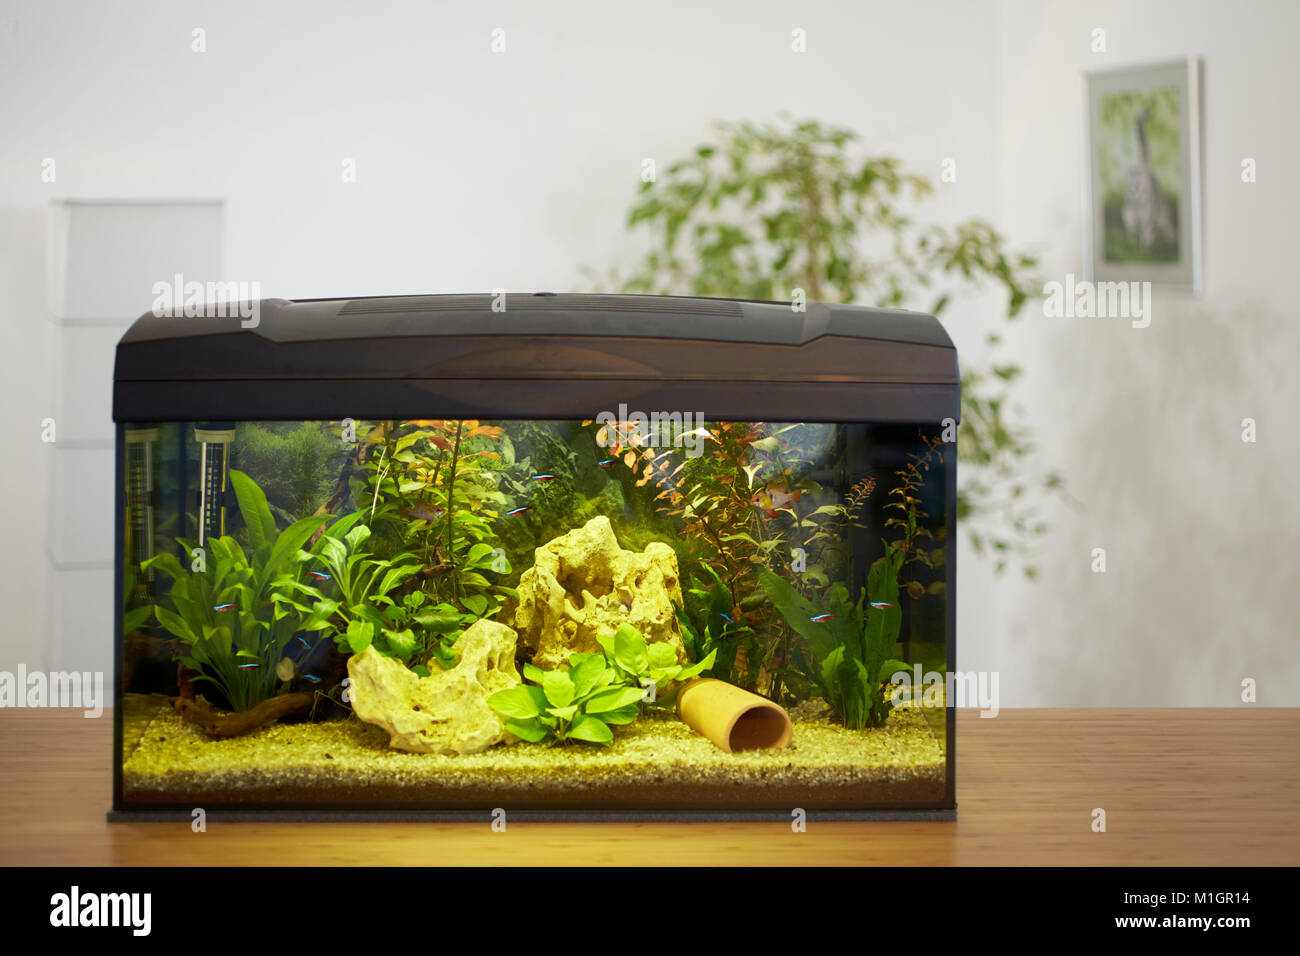 Tropical freshwater home aquarium. - Stock Image